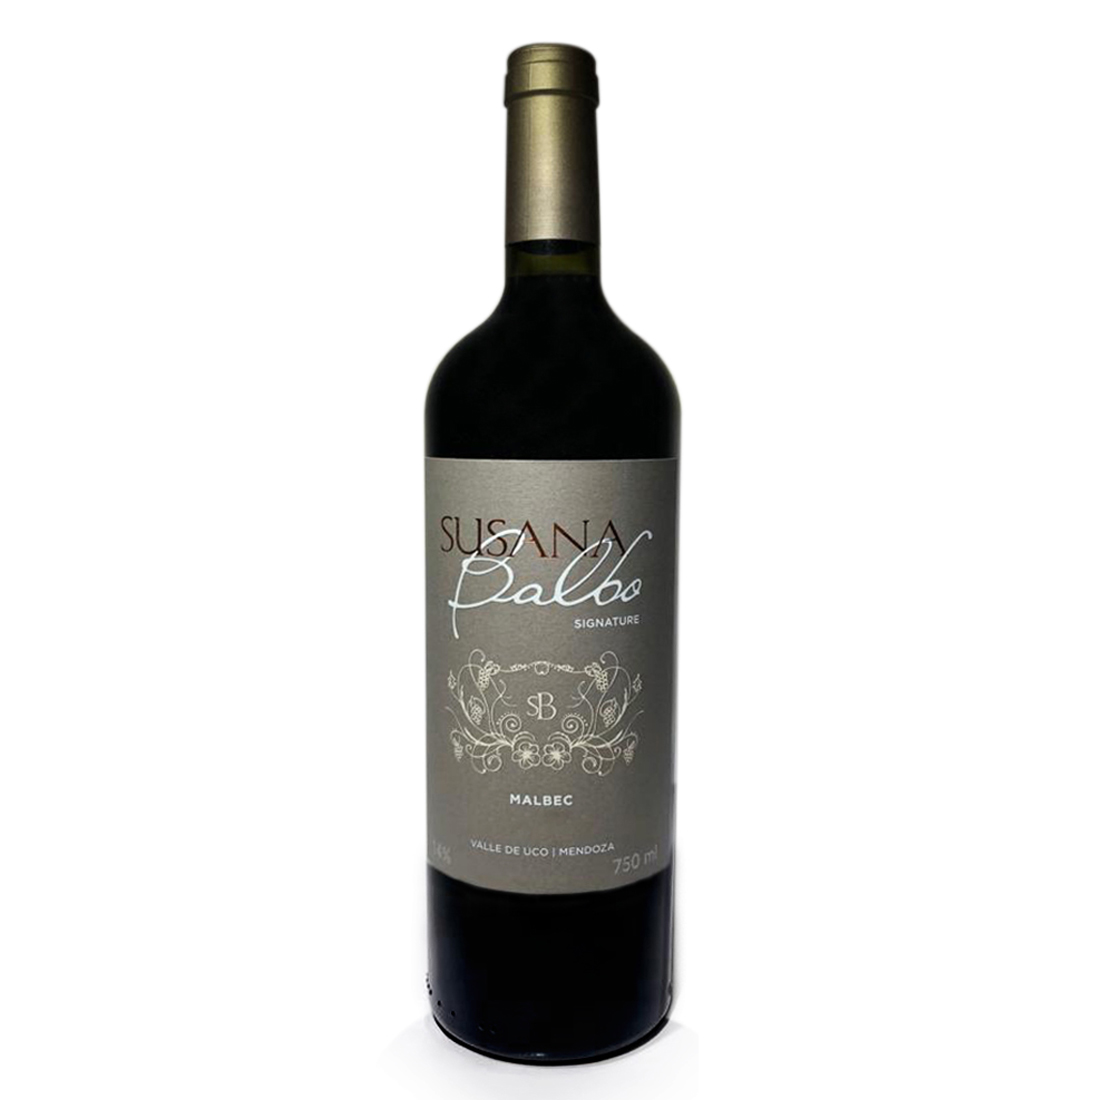 Vinho Susana Balbo Signature Malbec 750 ml